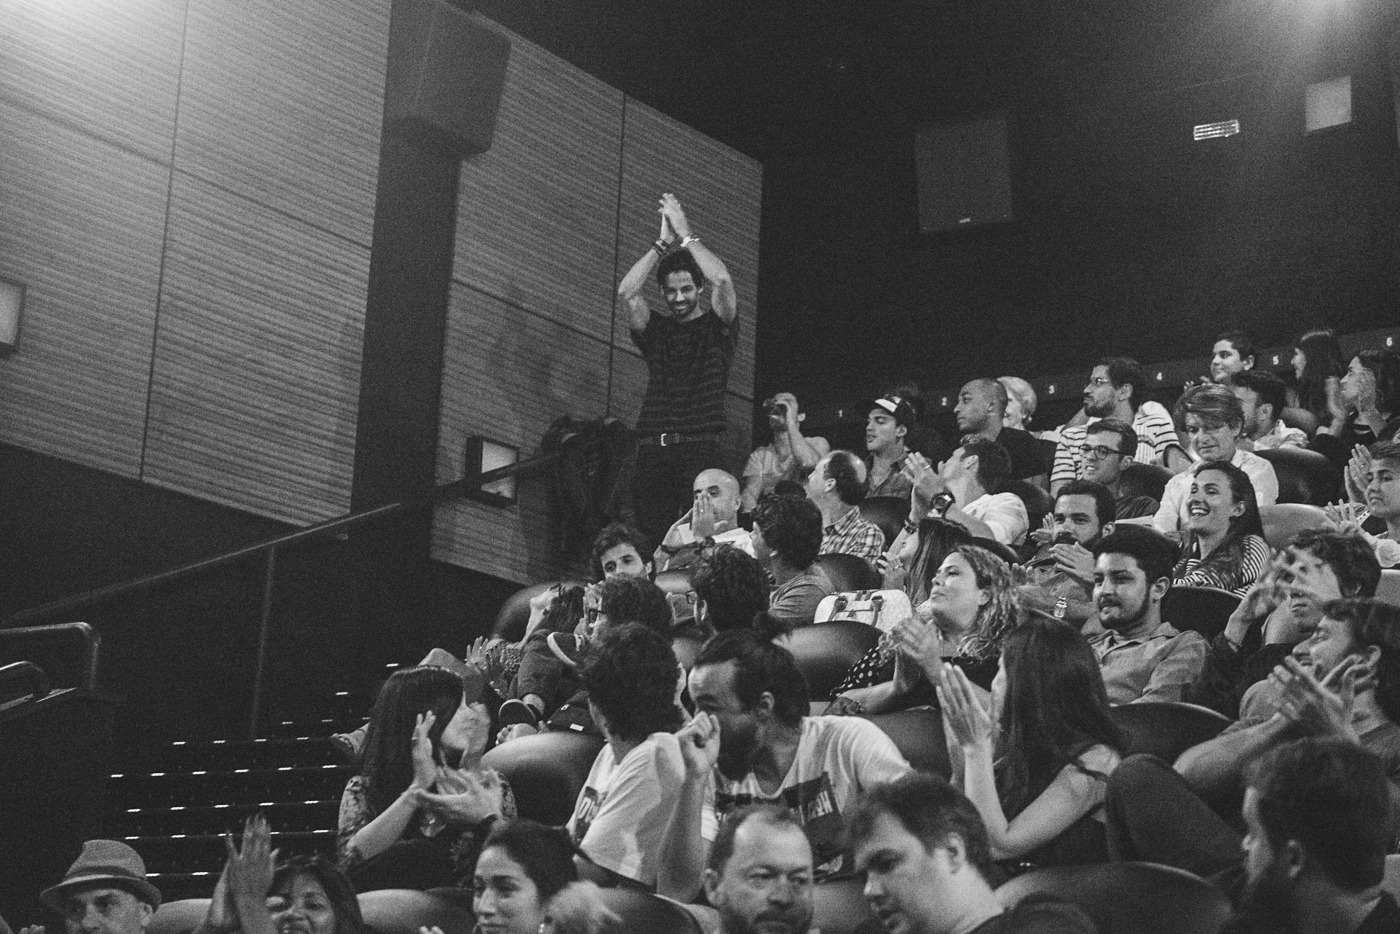 Filmworks film festival 2017 – Sinopses dos filmes